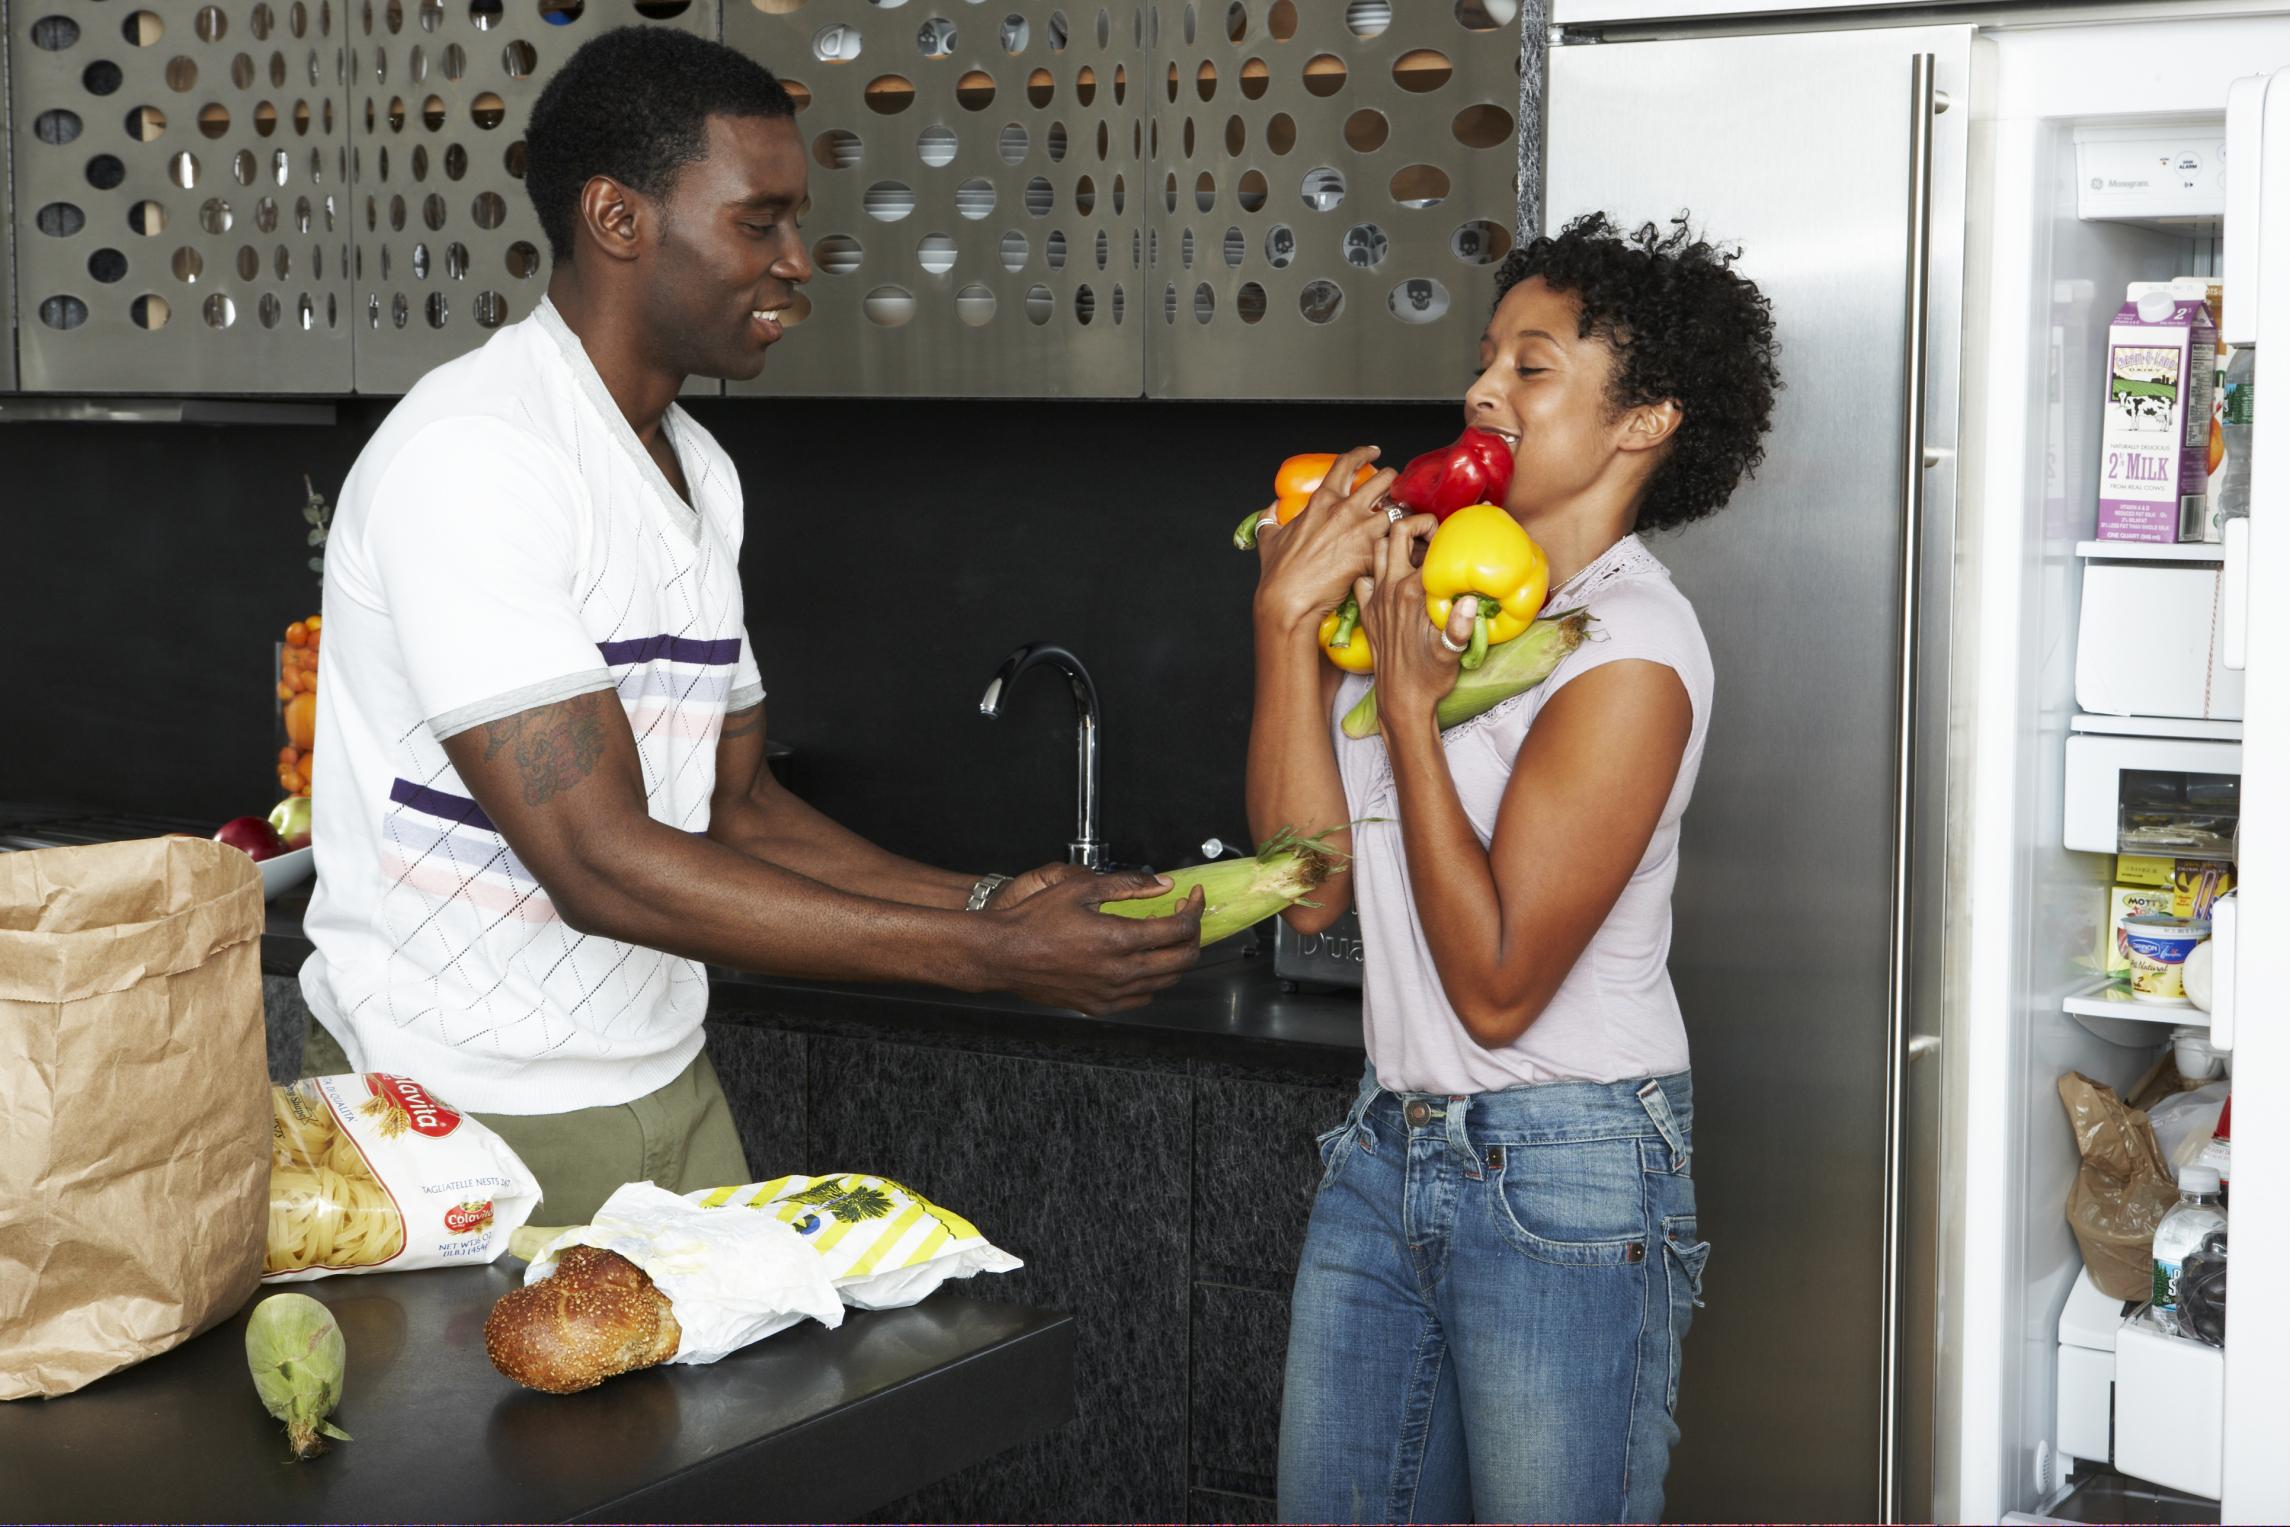 A man, woman, their groceries